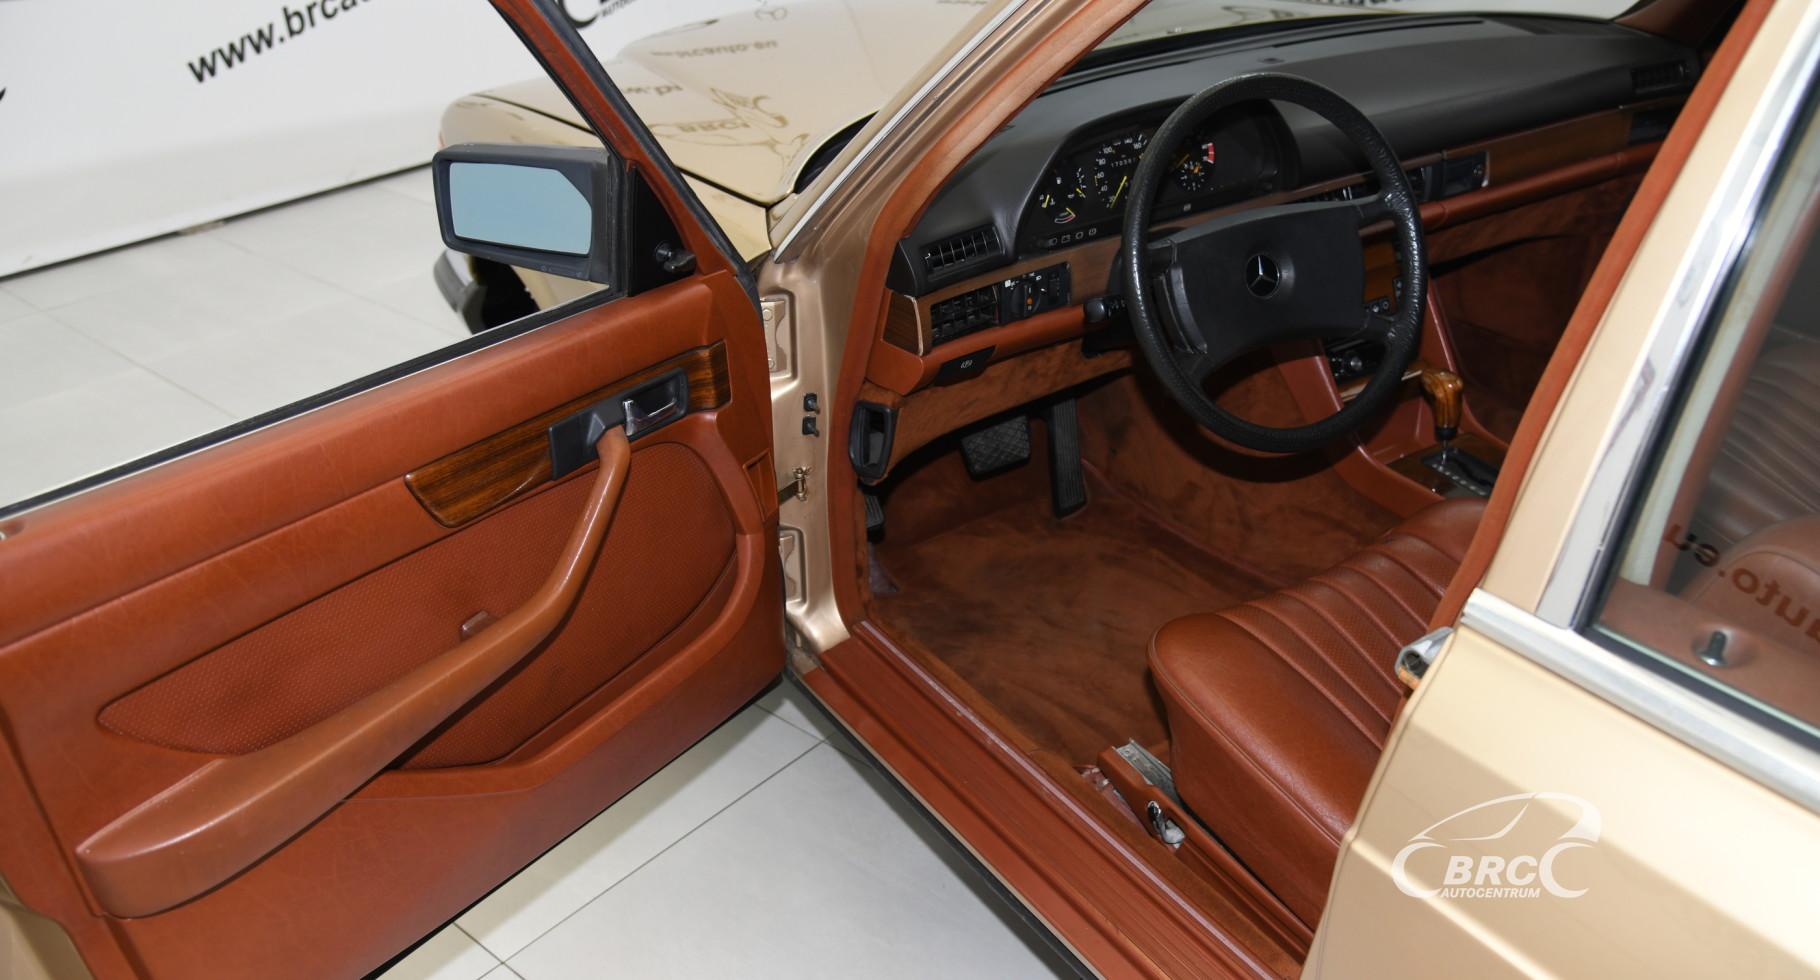 Mercedes-Benz 500 SE Automatas